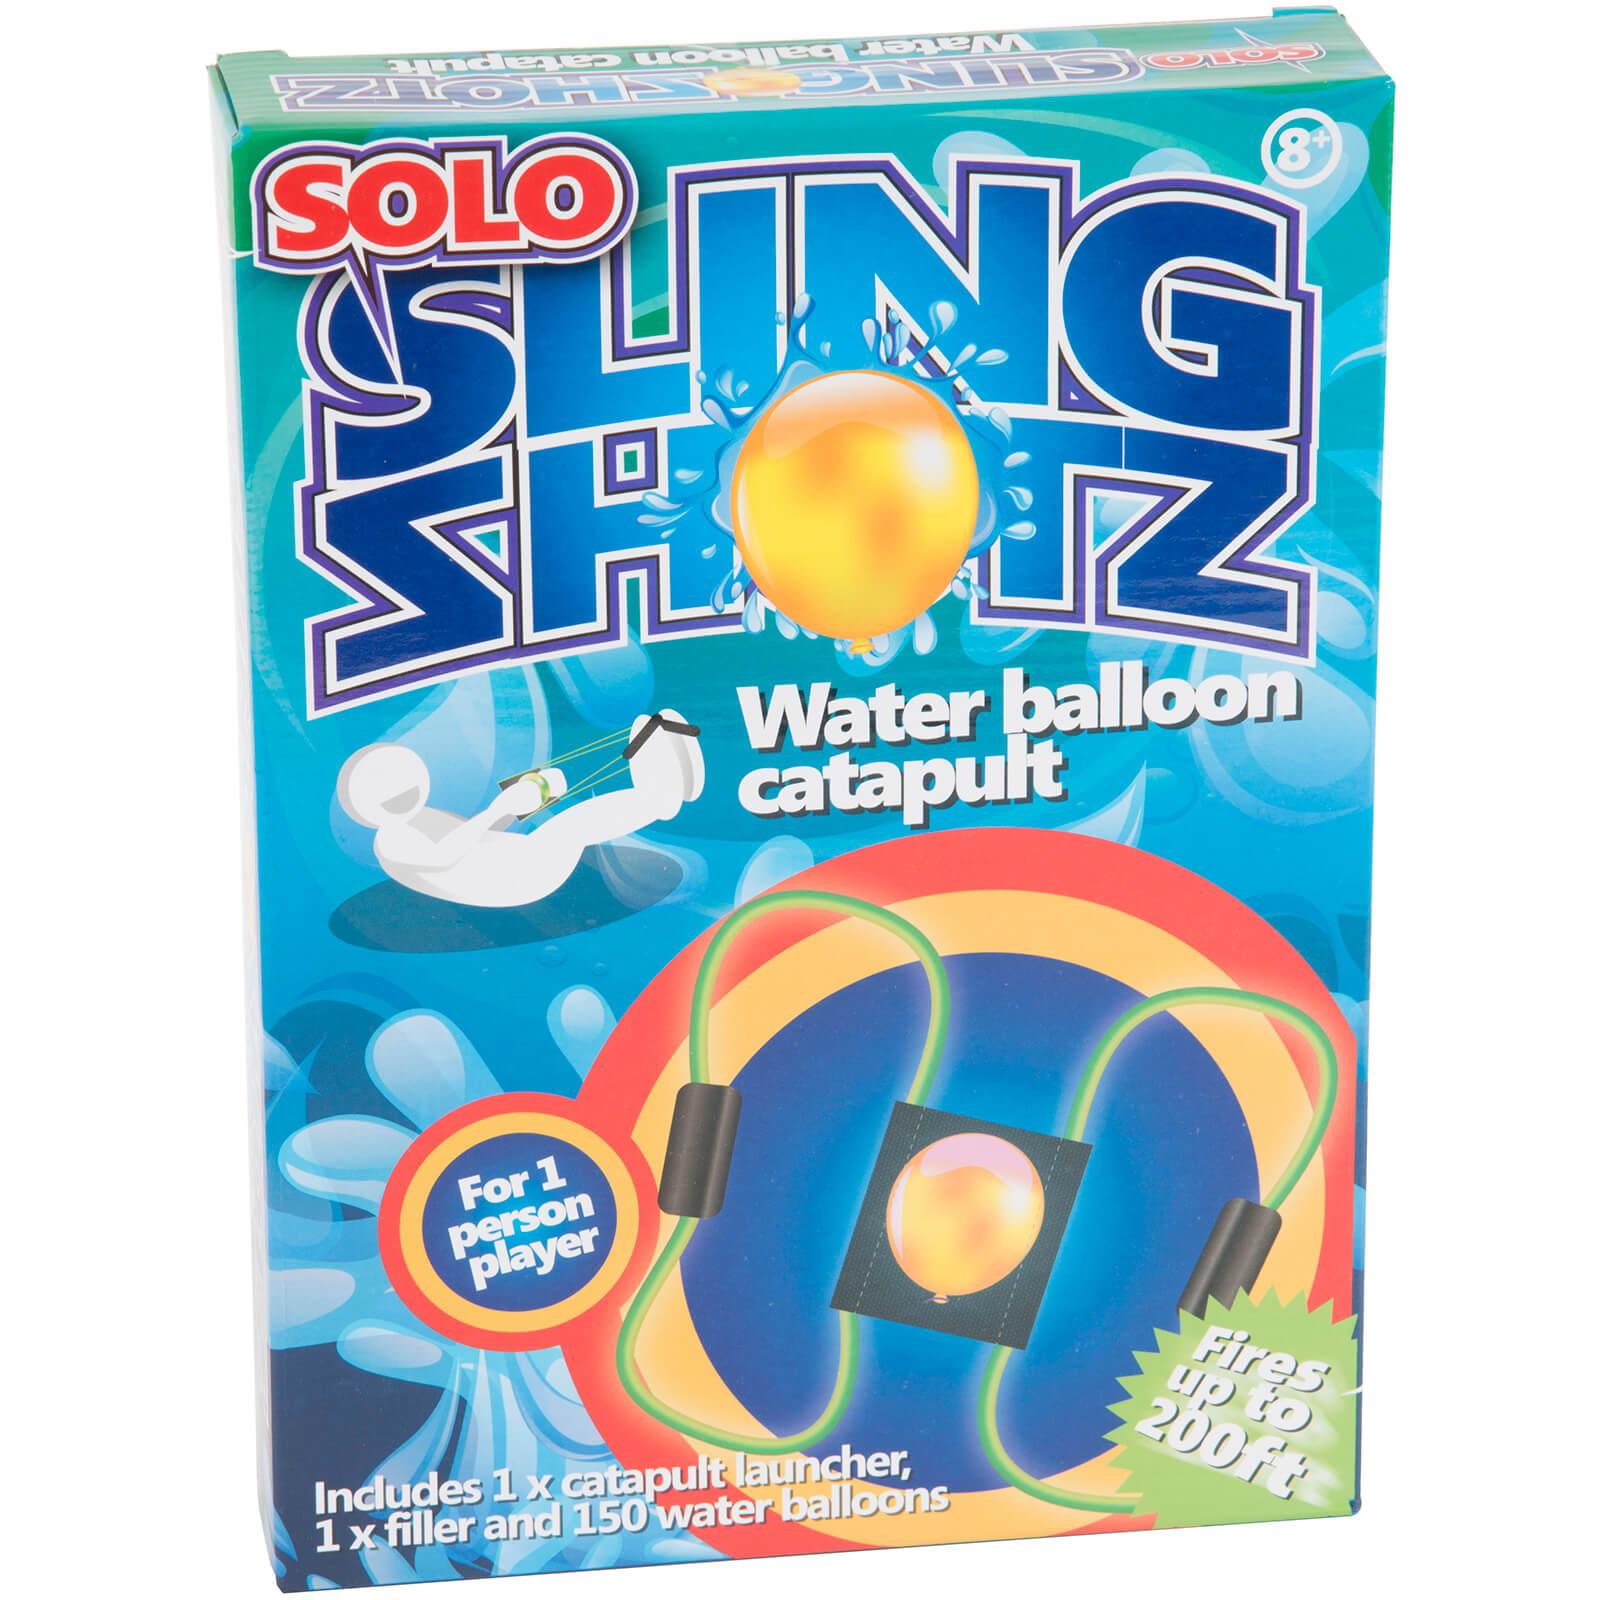 Funtime Sling Shotz